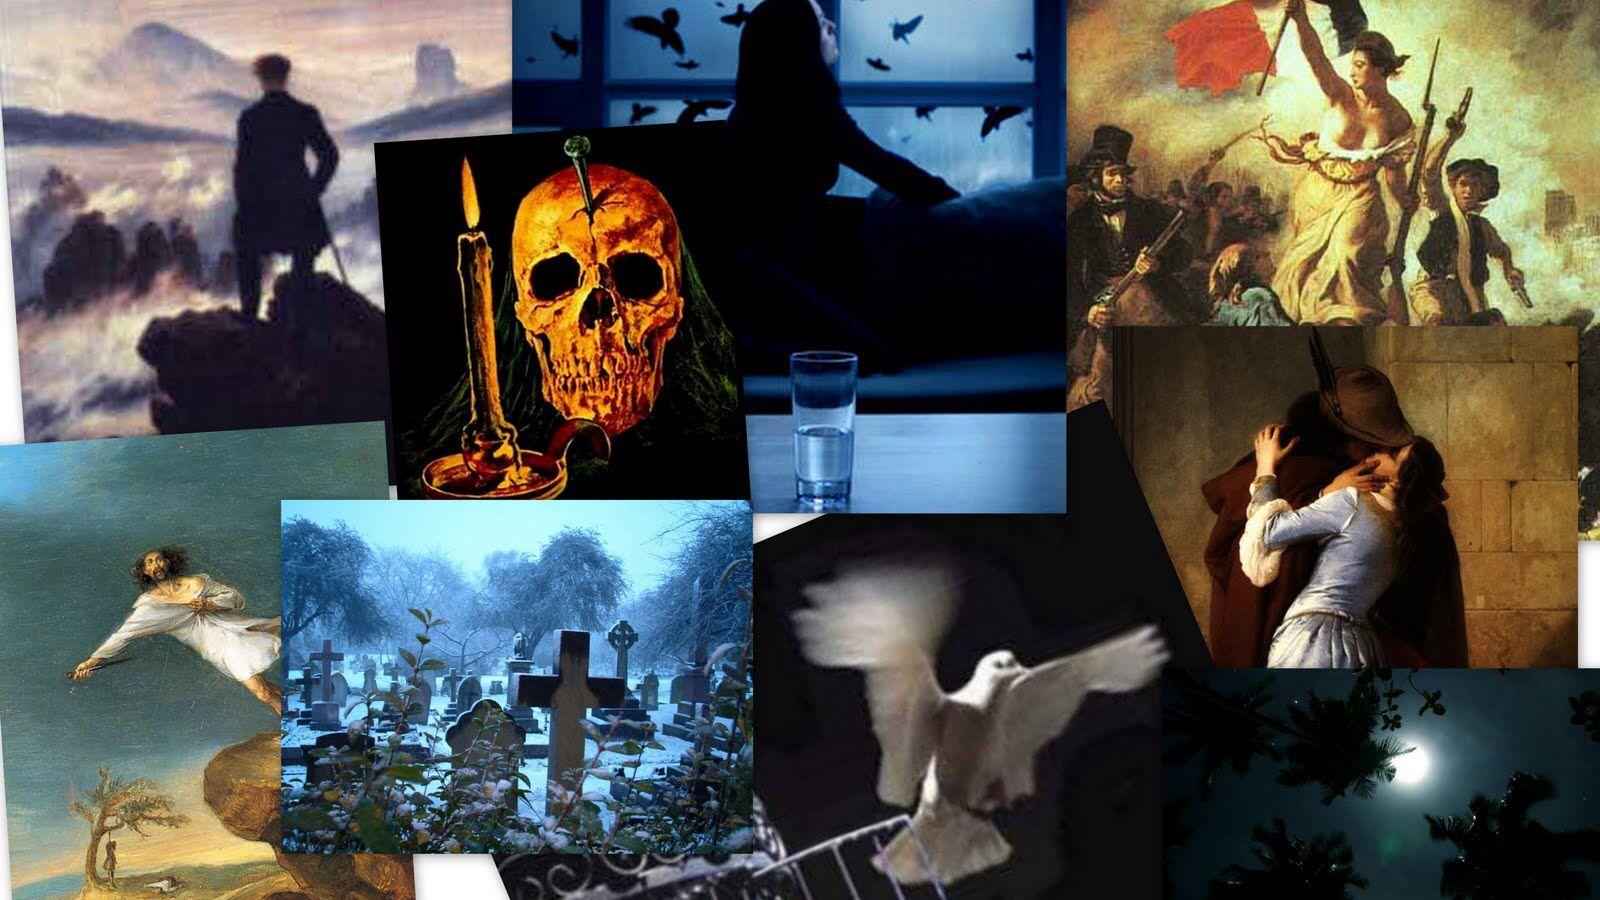 Collage del romanticismo y neoclasicismo. Neoclasicismo